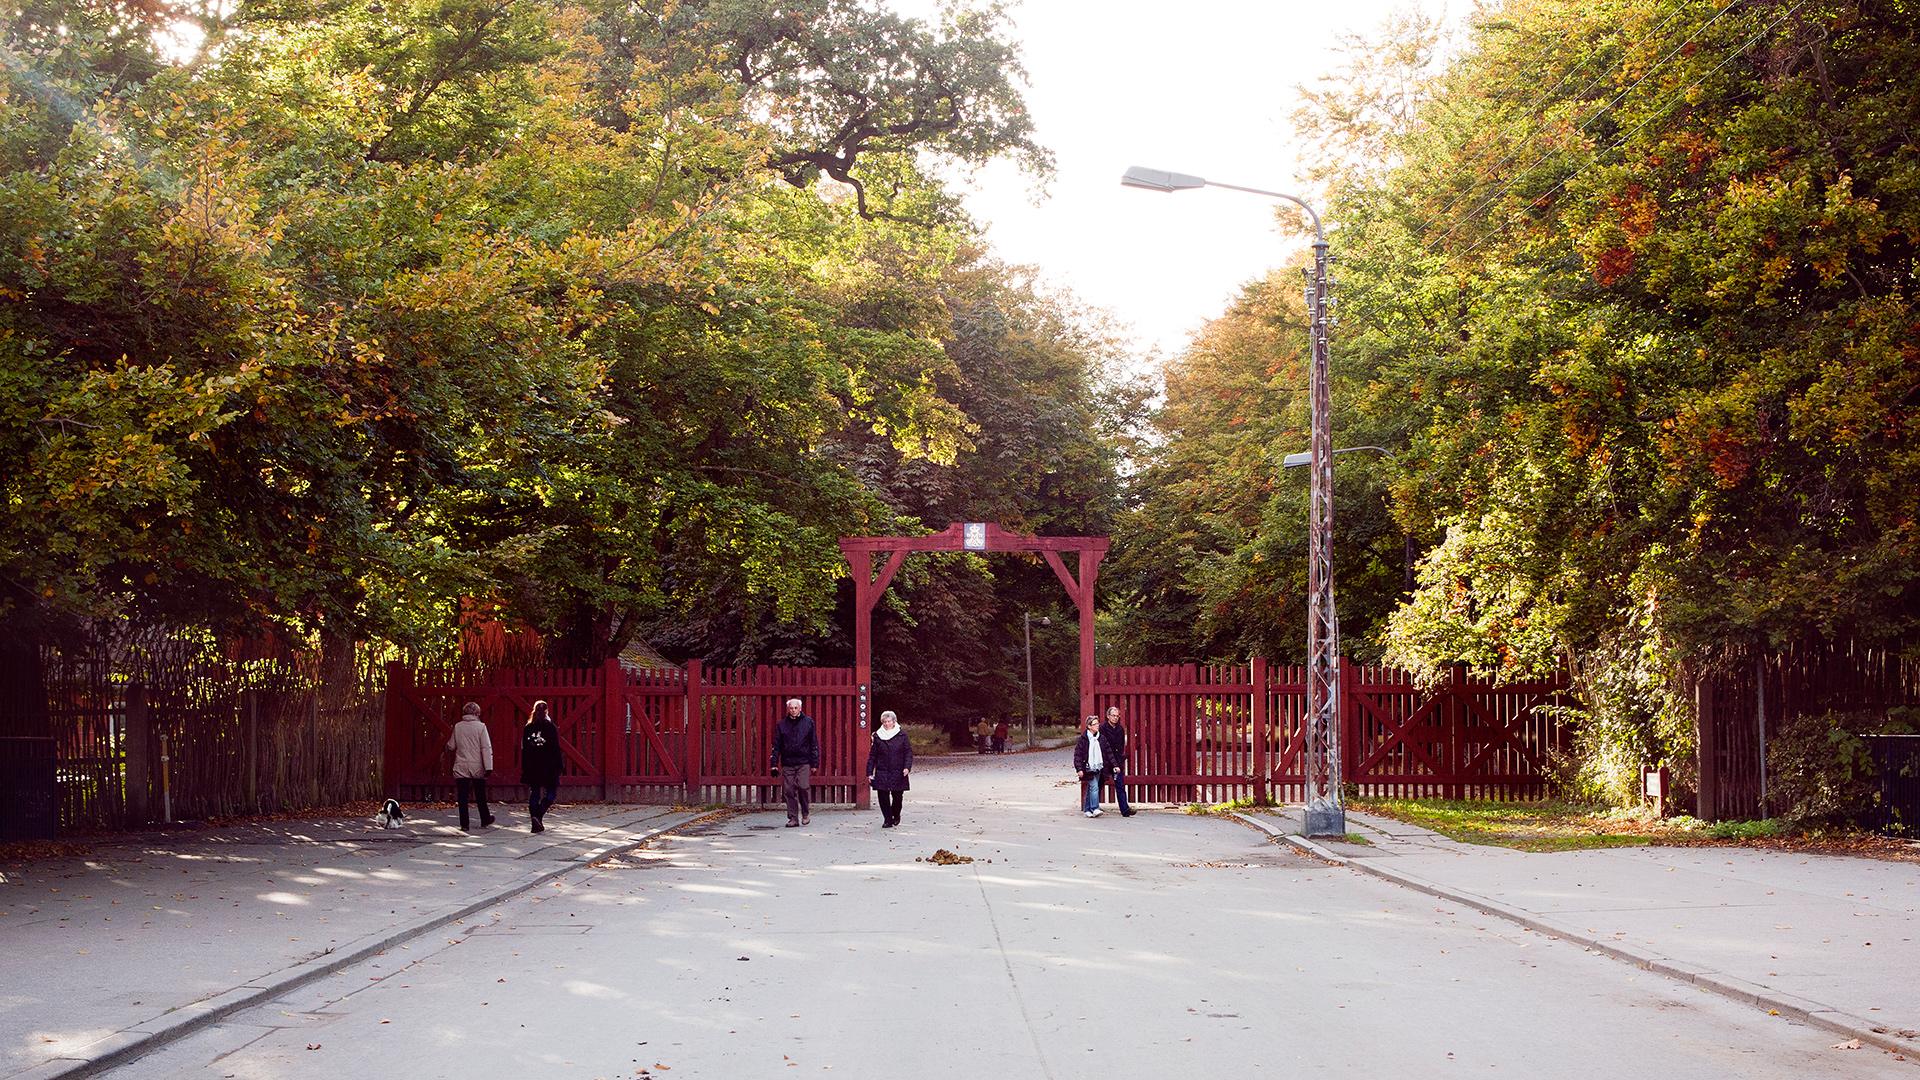 røde porte dyrehaven